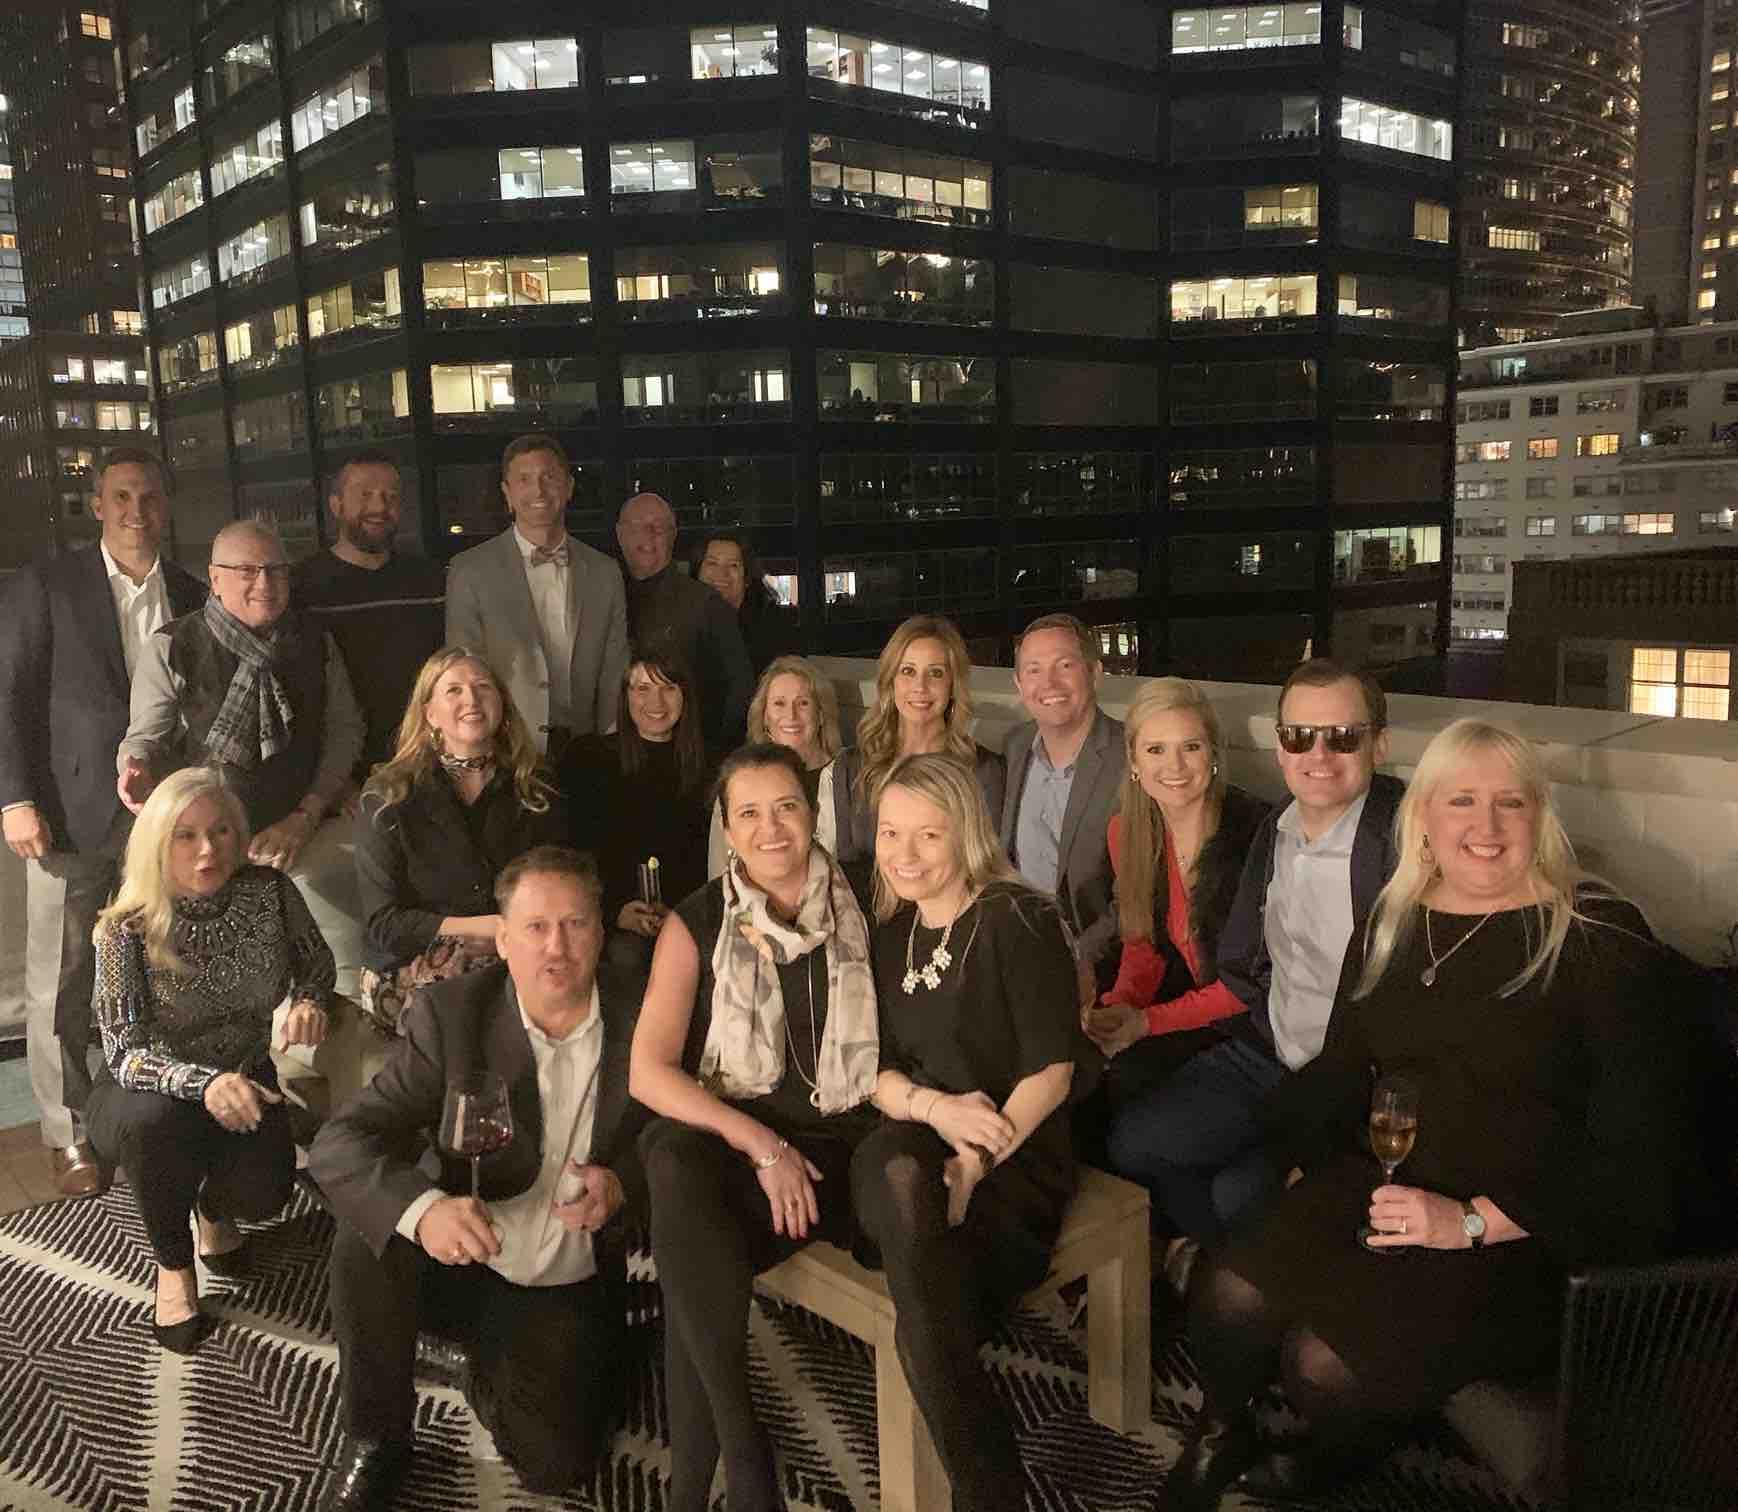 John Ross Palmer Birthday Club Group Photo in NYC